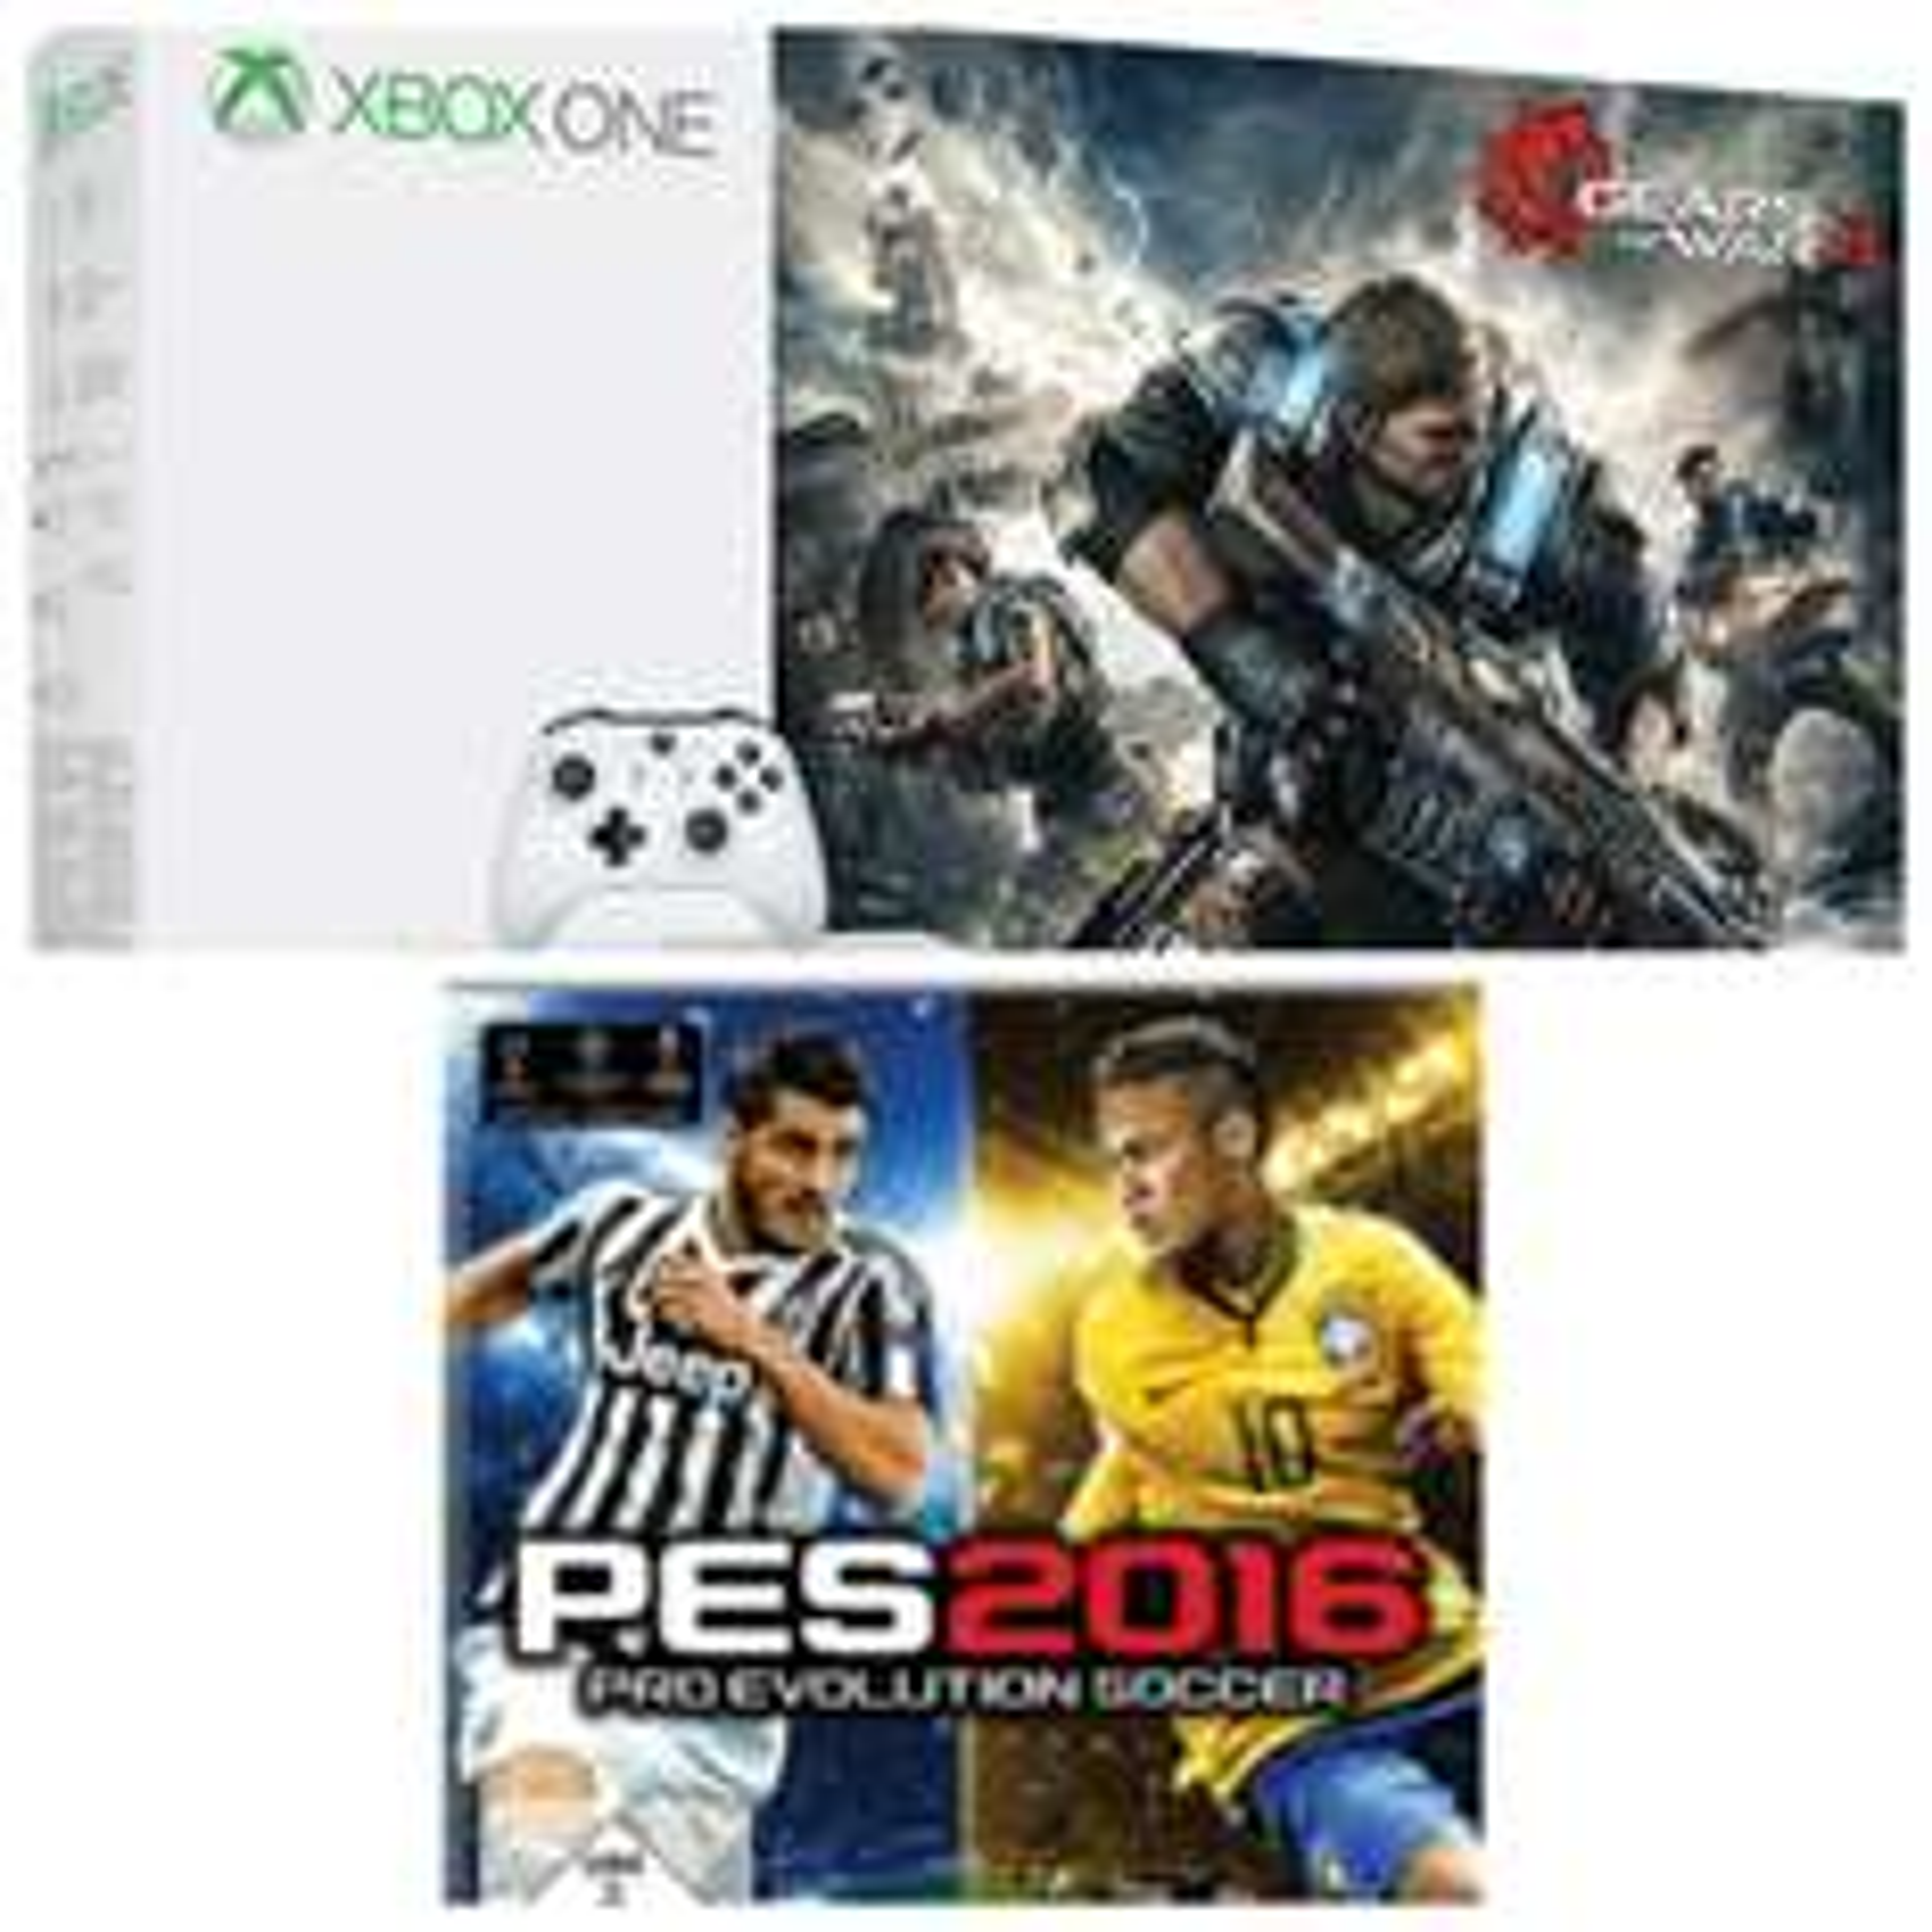 Microsoft Xbox One S 1TB + Gears of War 4 (Saturn)